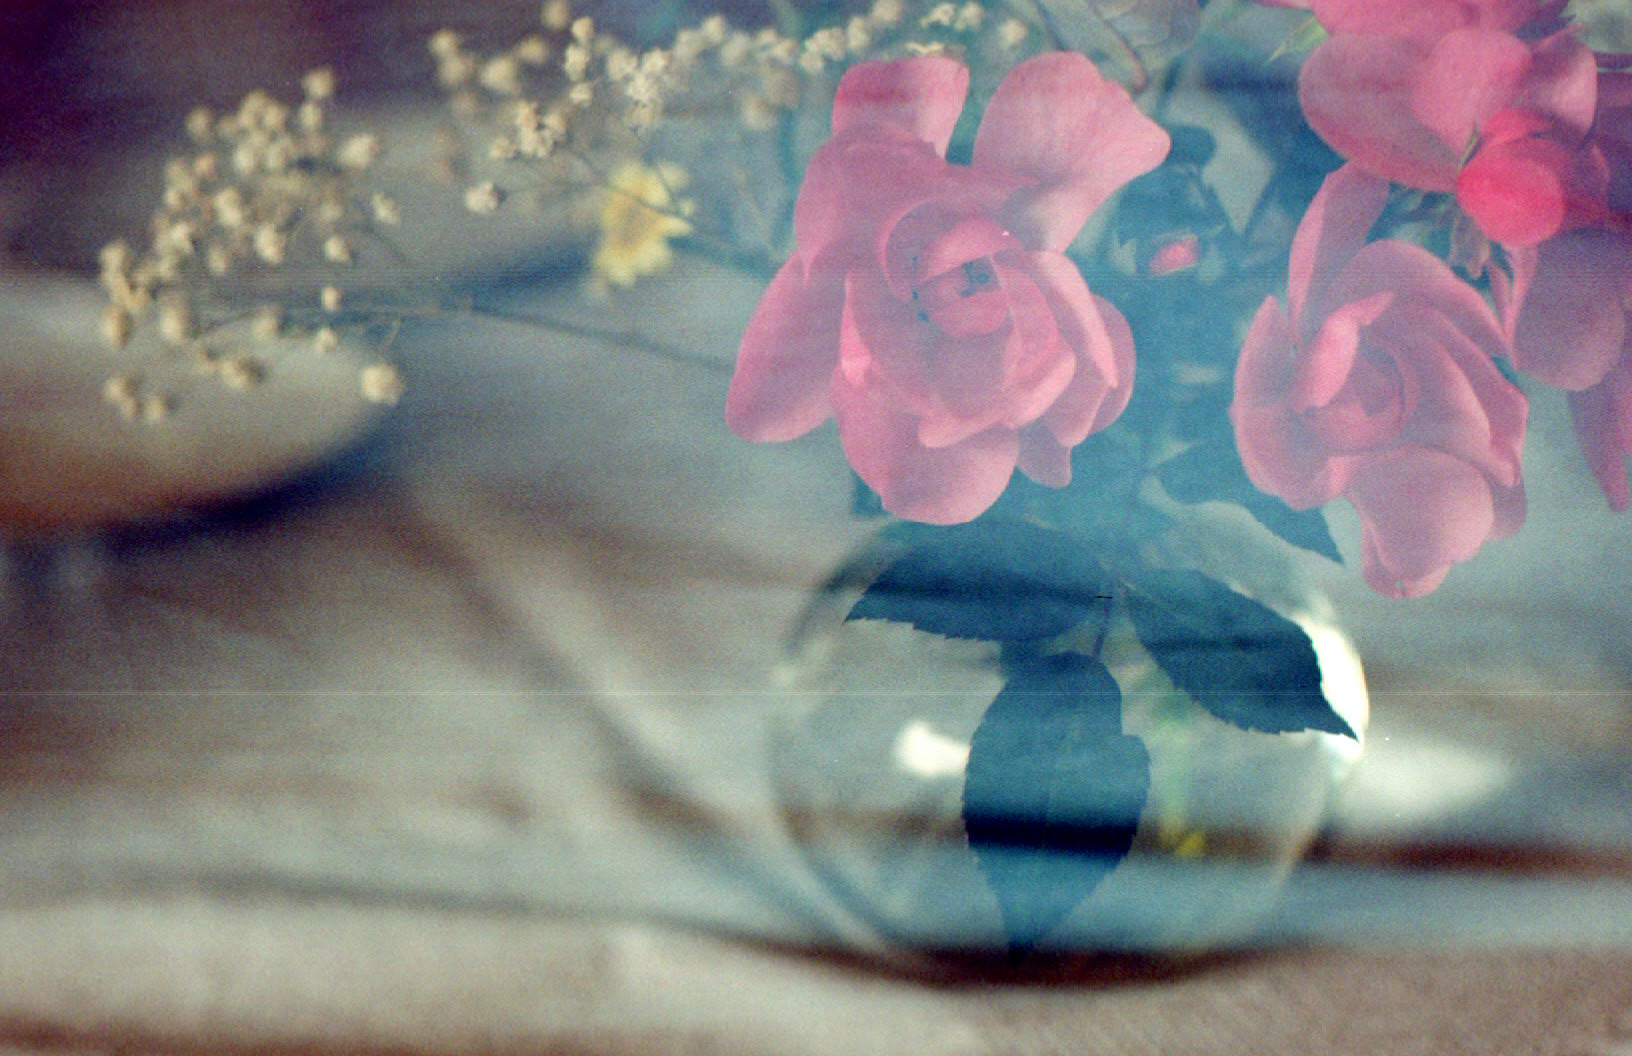 ©Toni Theresa Uhlig - Expired Memories